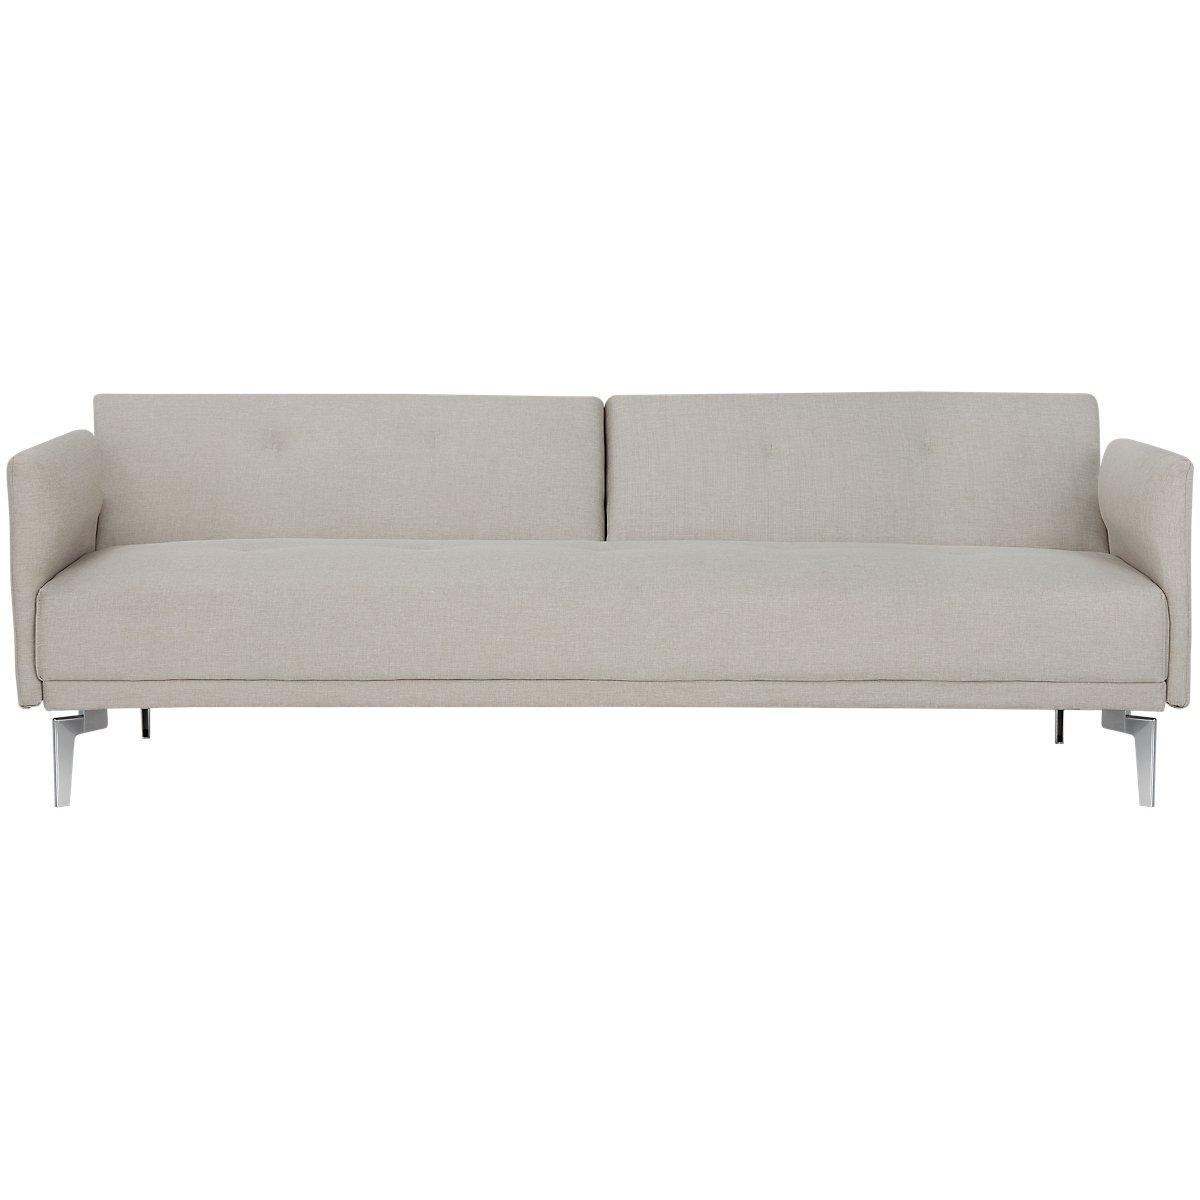 Amani Beige Sofa Futon View Larger